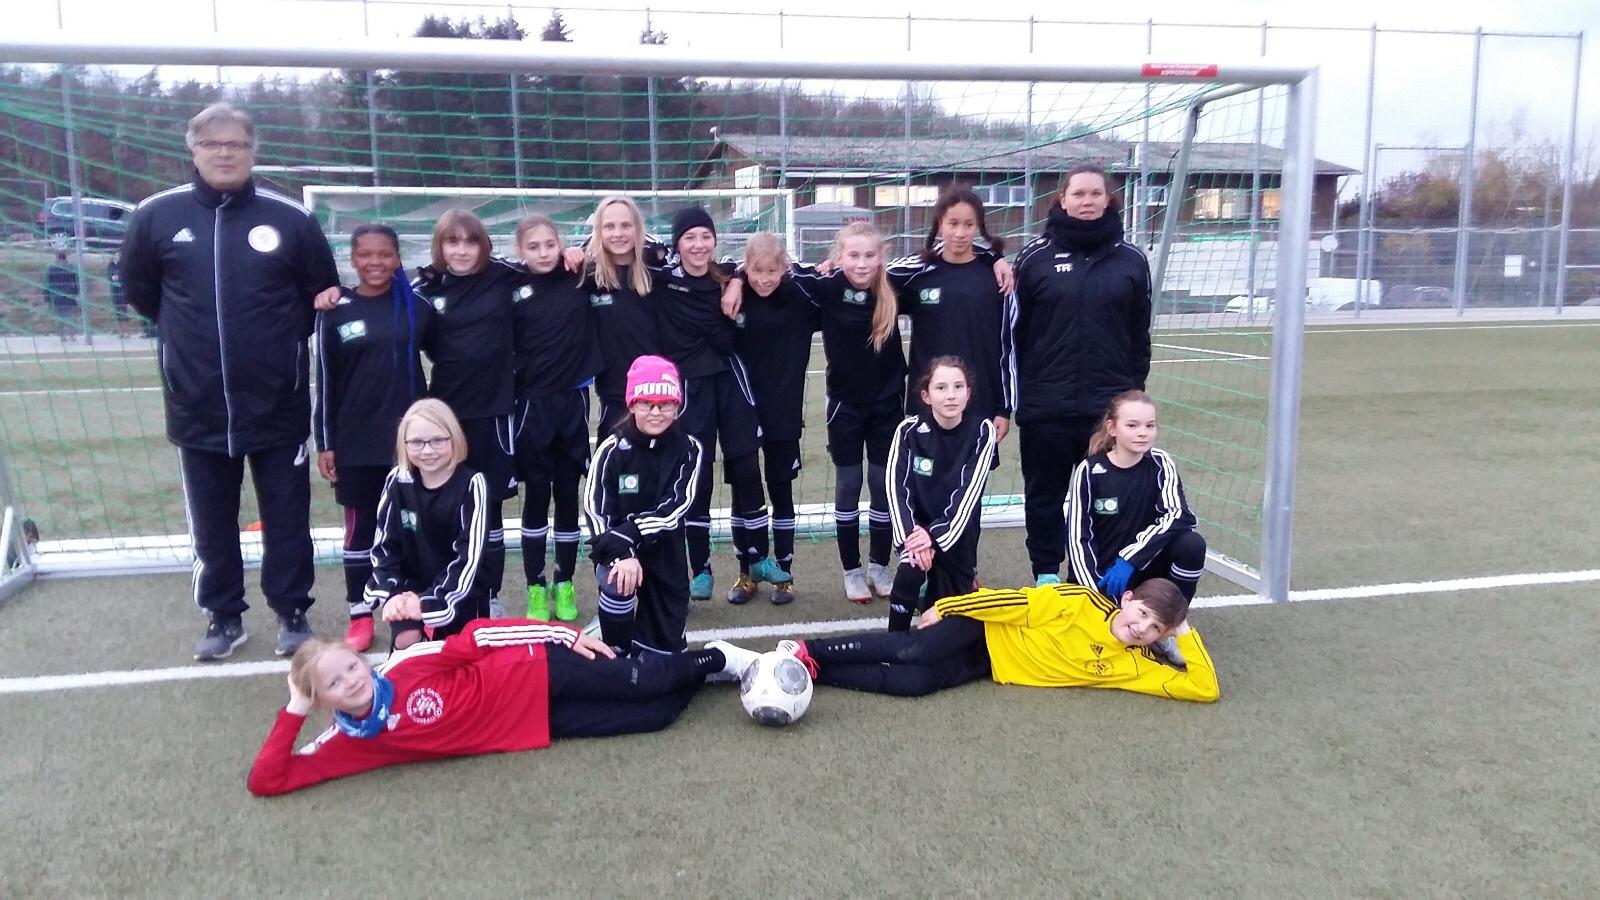 Testspiel JSG Stadt Gladenbach D-Jgd. vs. RA U12